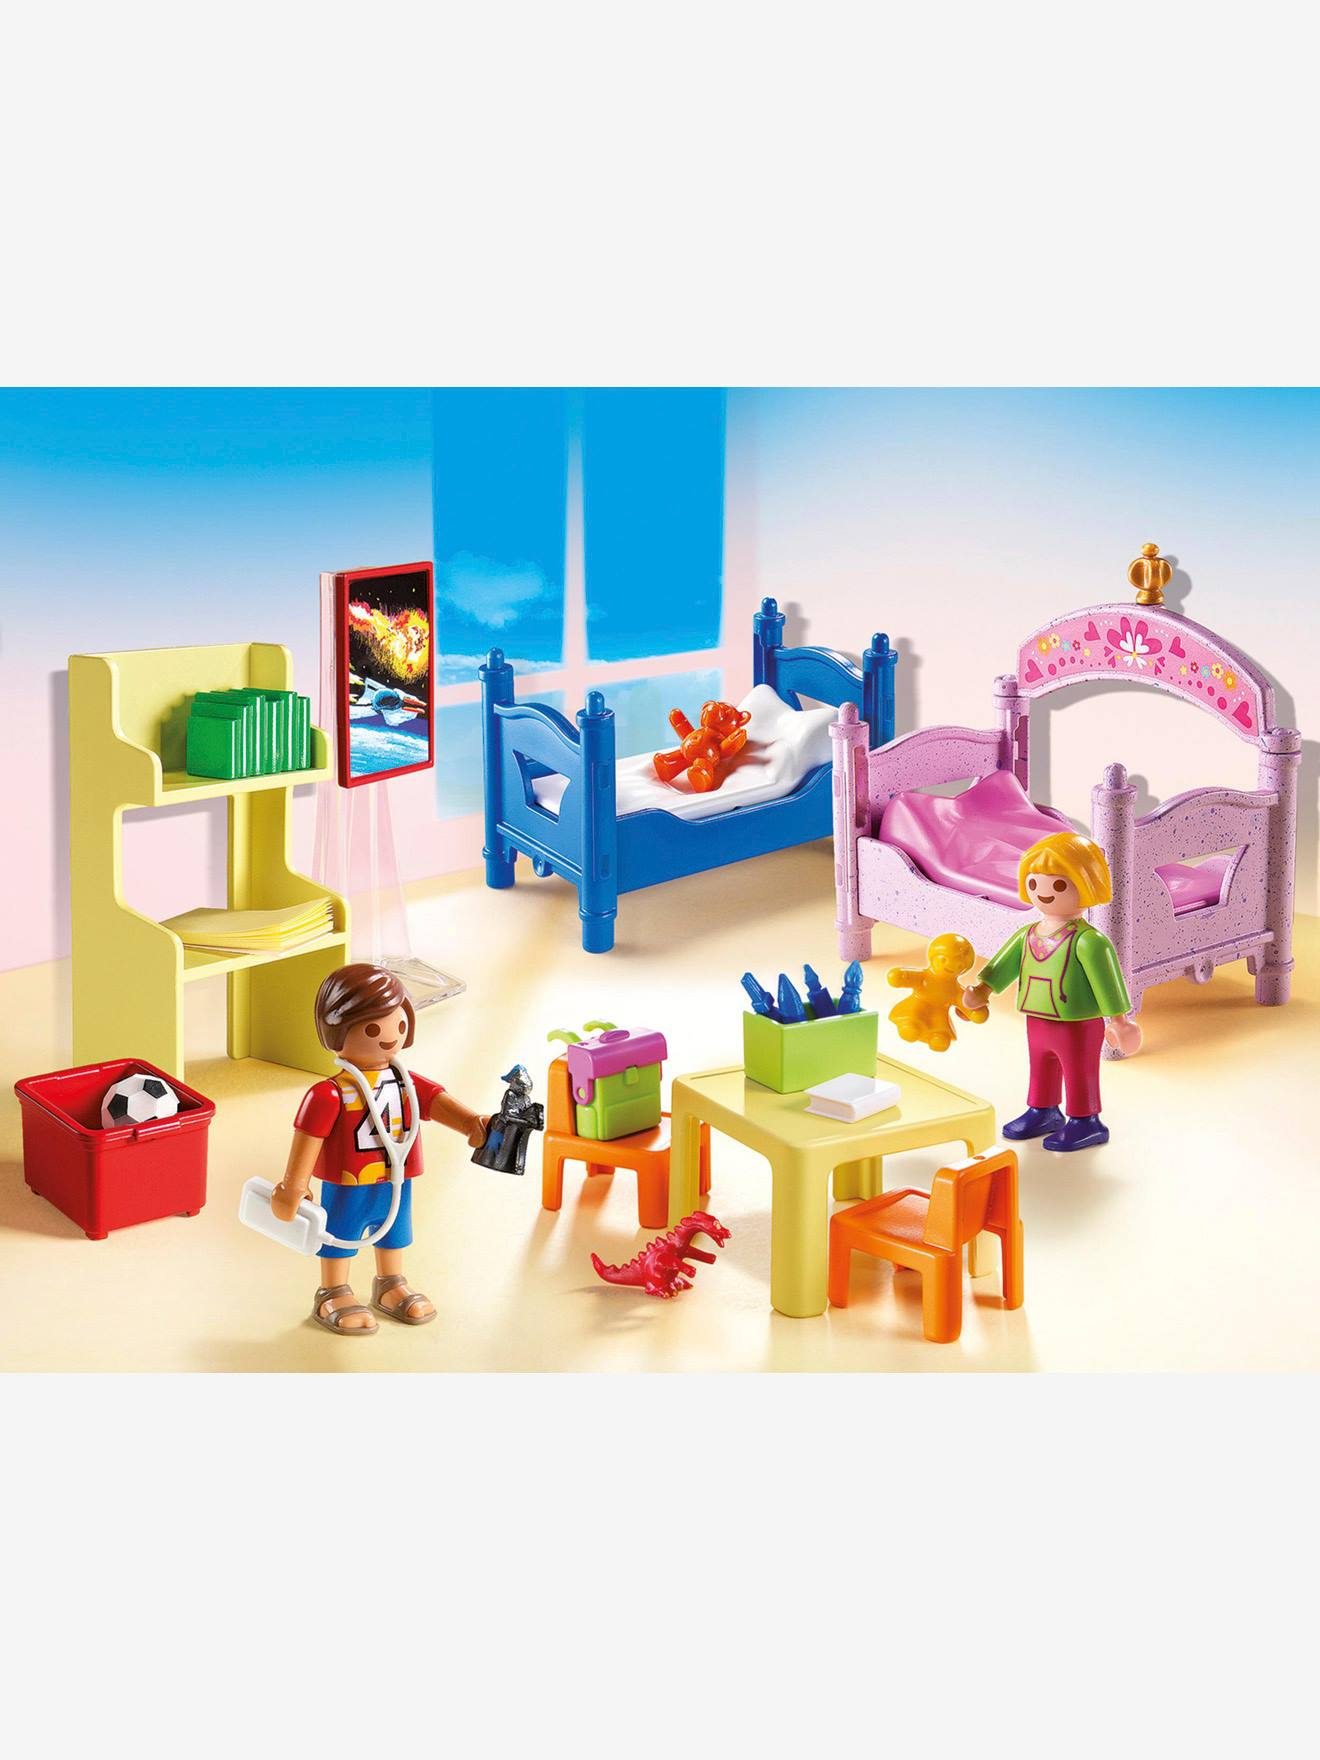 5306 Chambre d\'enfants avec lits superposés Playmobil multicolore -  Playmobil